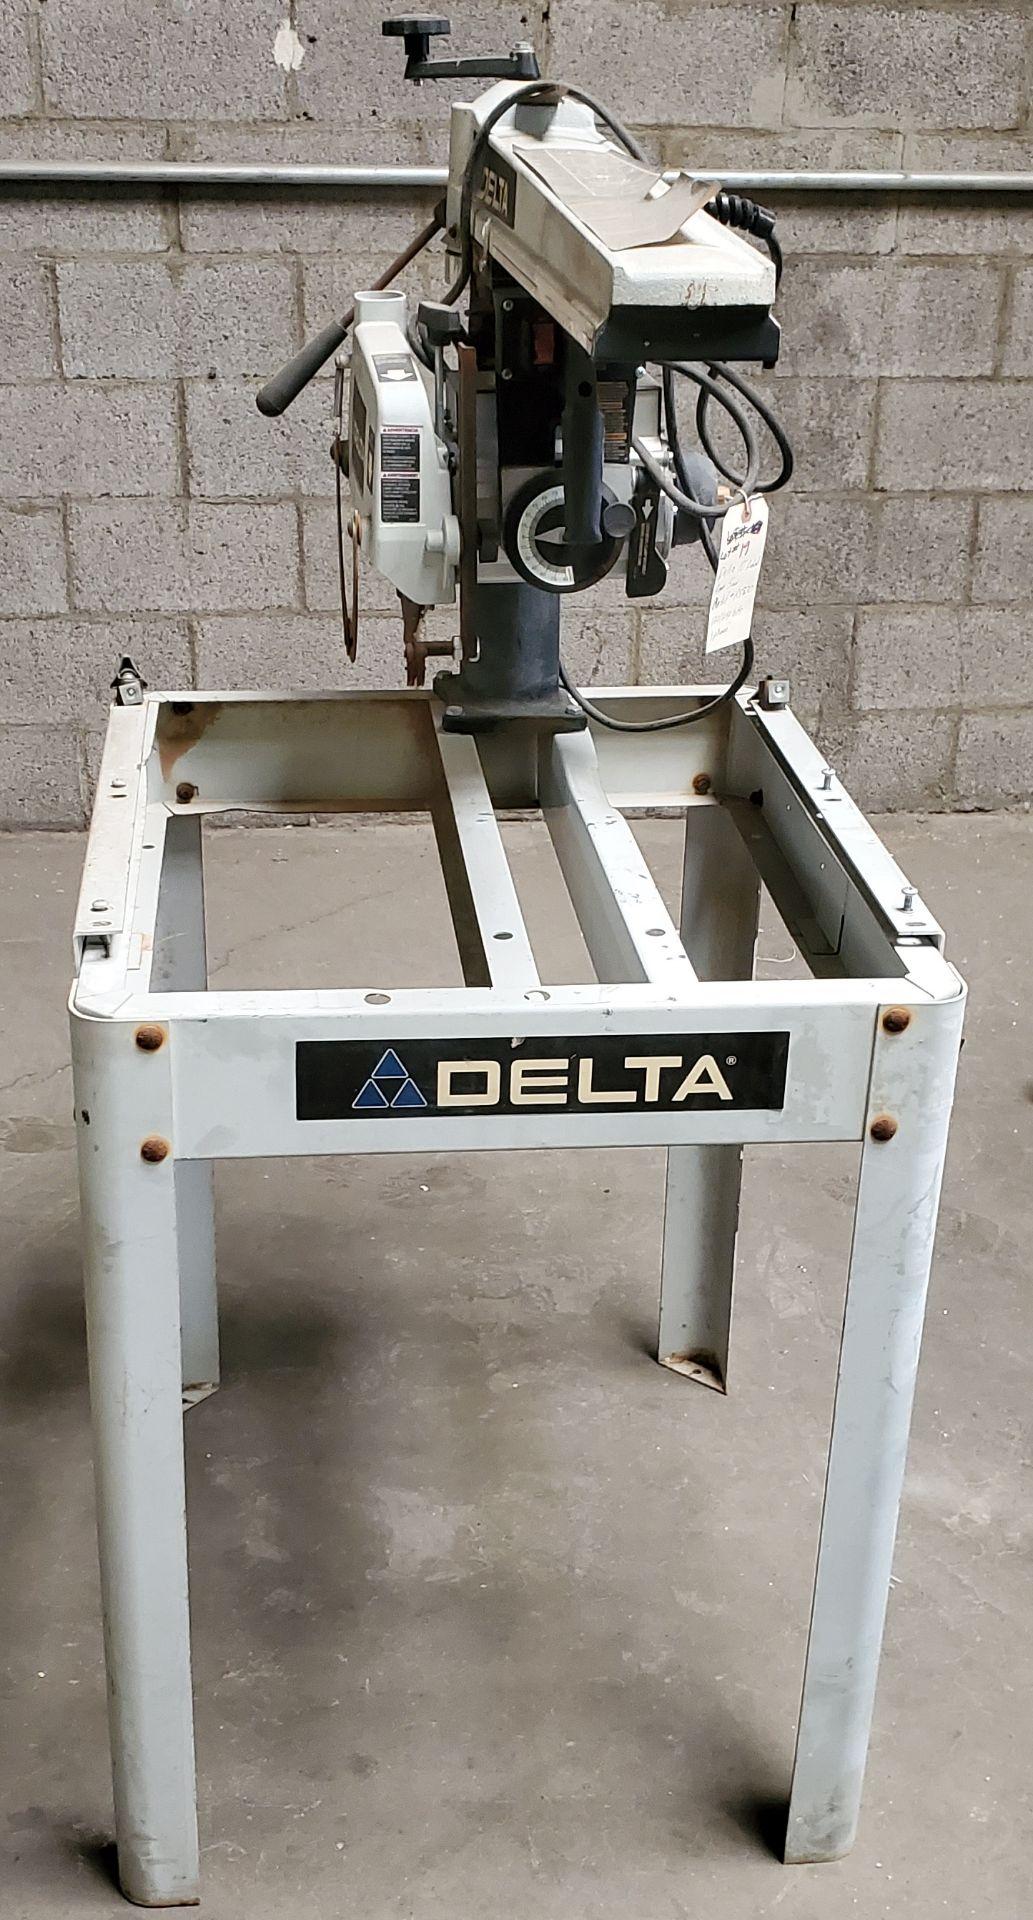 "Lot 19 - Delta 10"" Radical Arm Saw, Model #R5830 120/240 Volts 1Phase Motor"